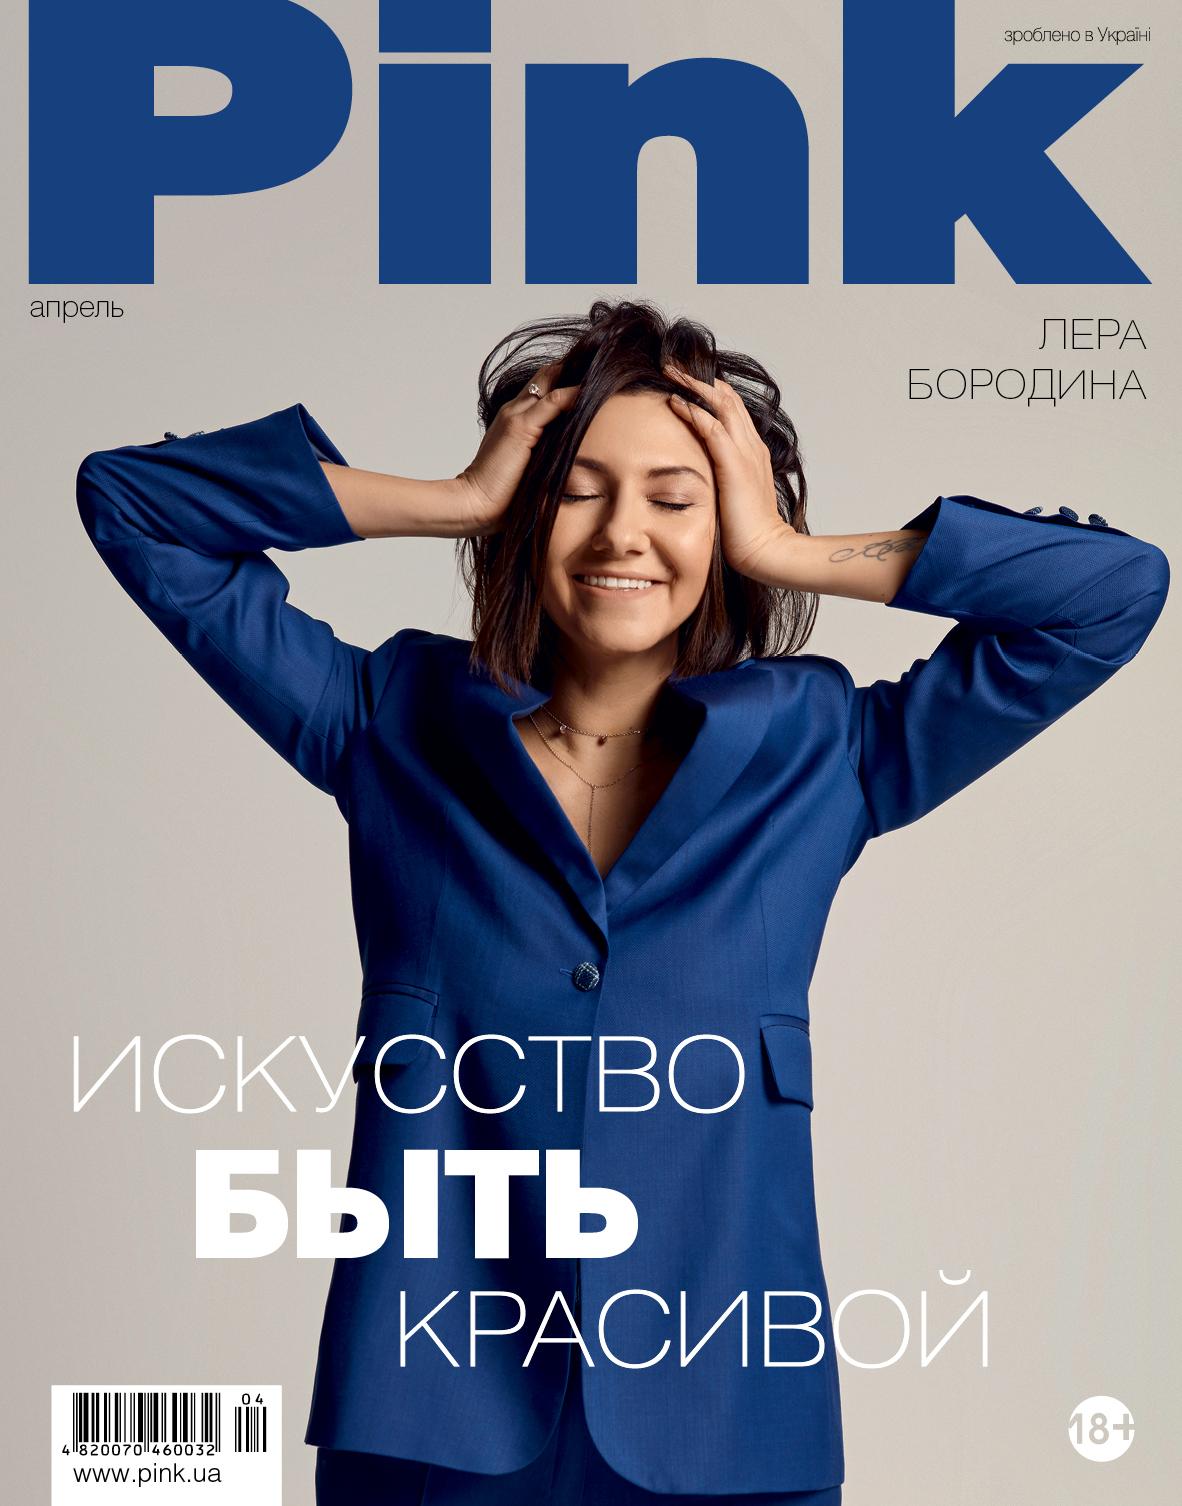 Pink Magazine Lada Legina Jewelry.jpg